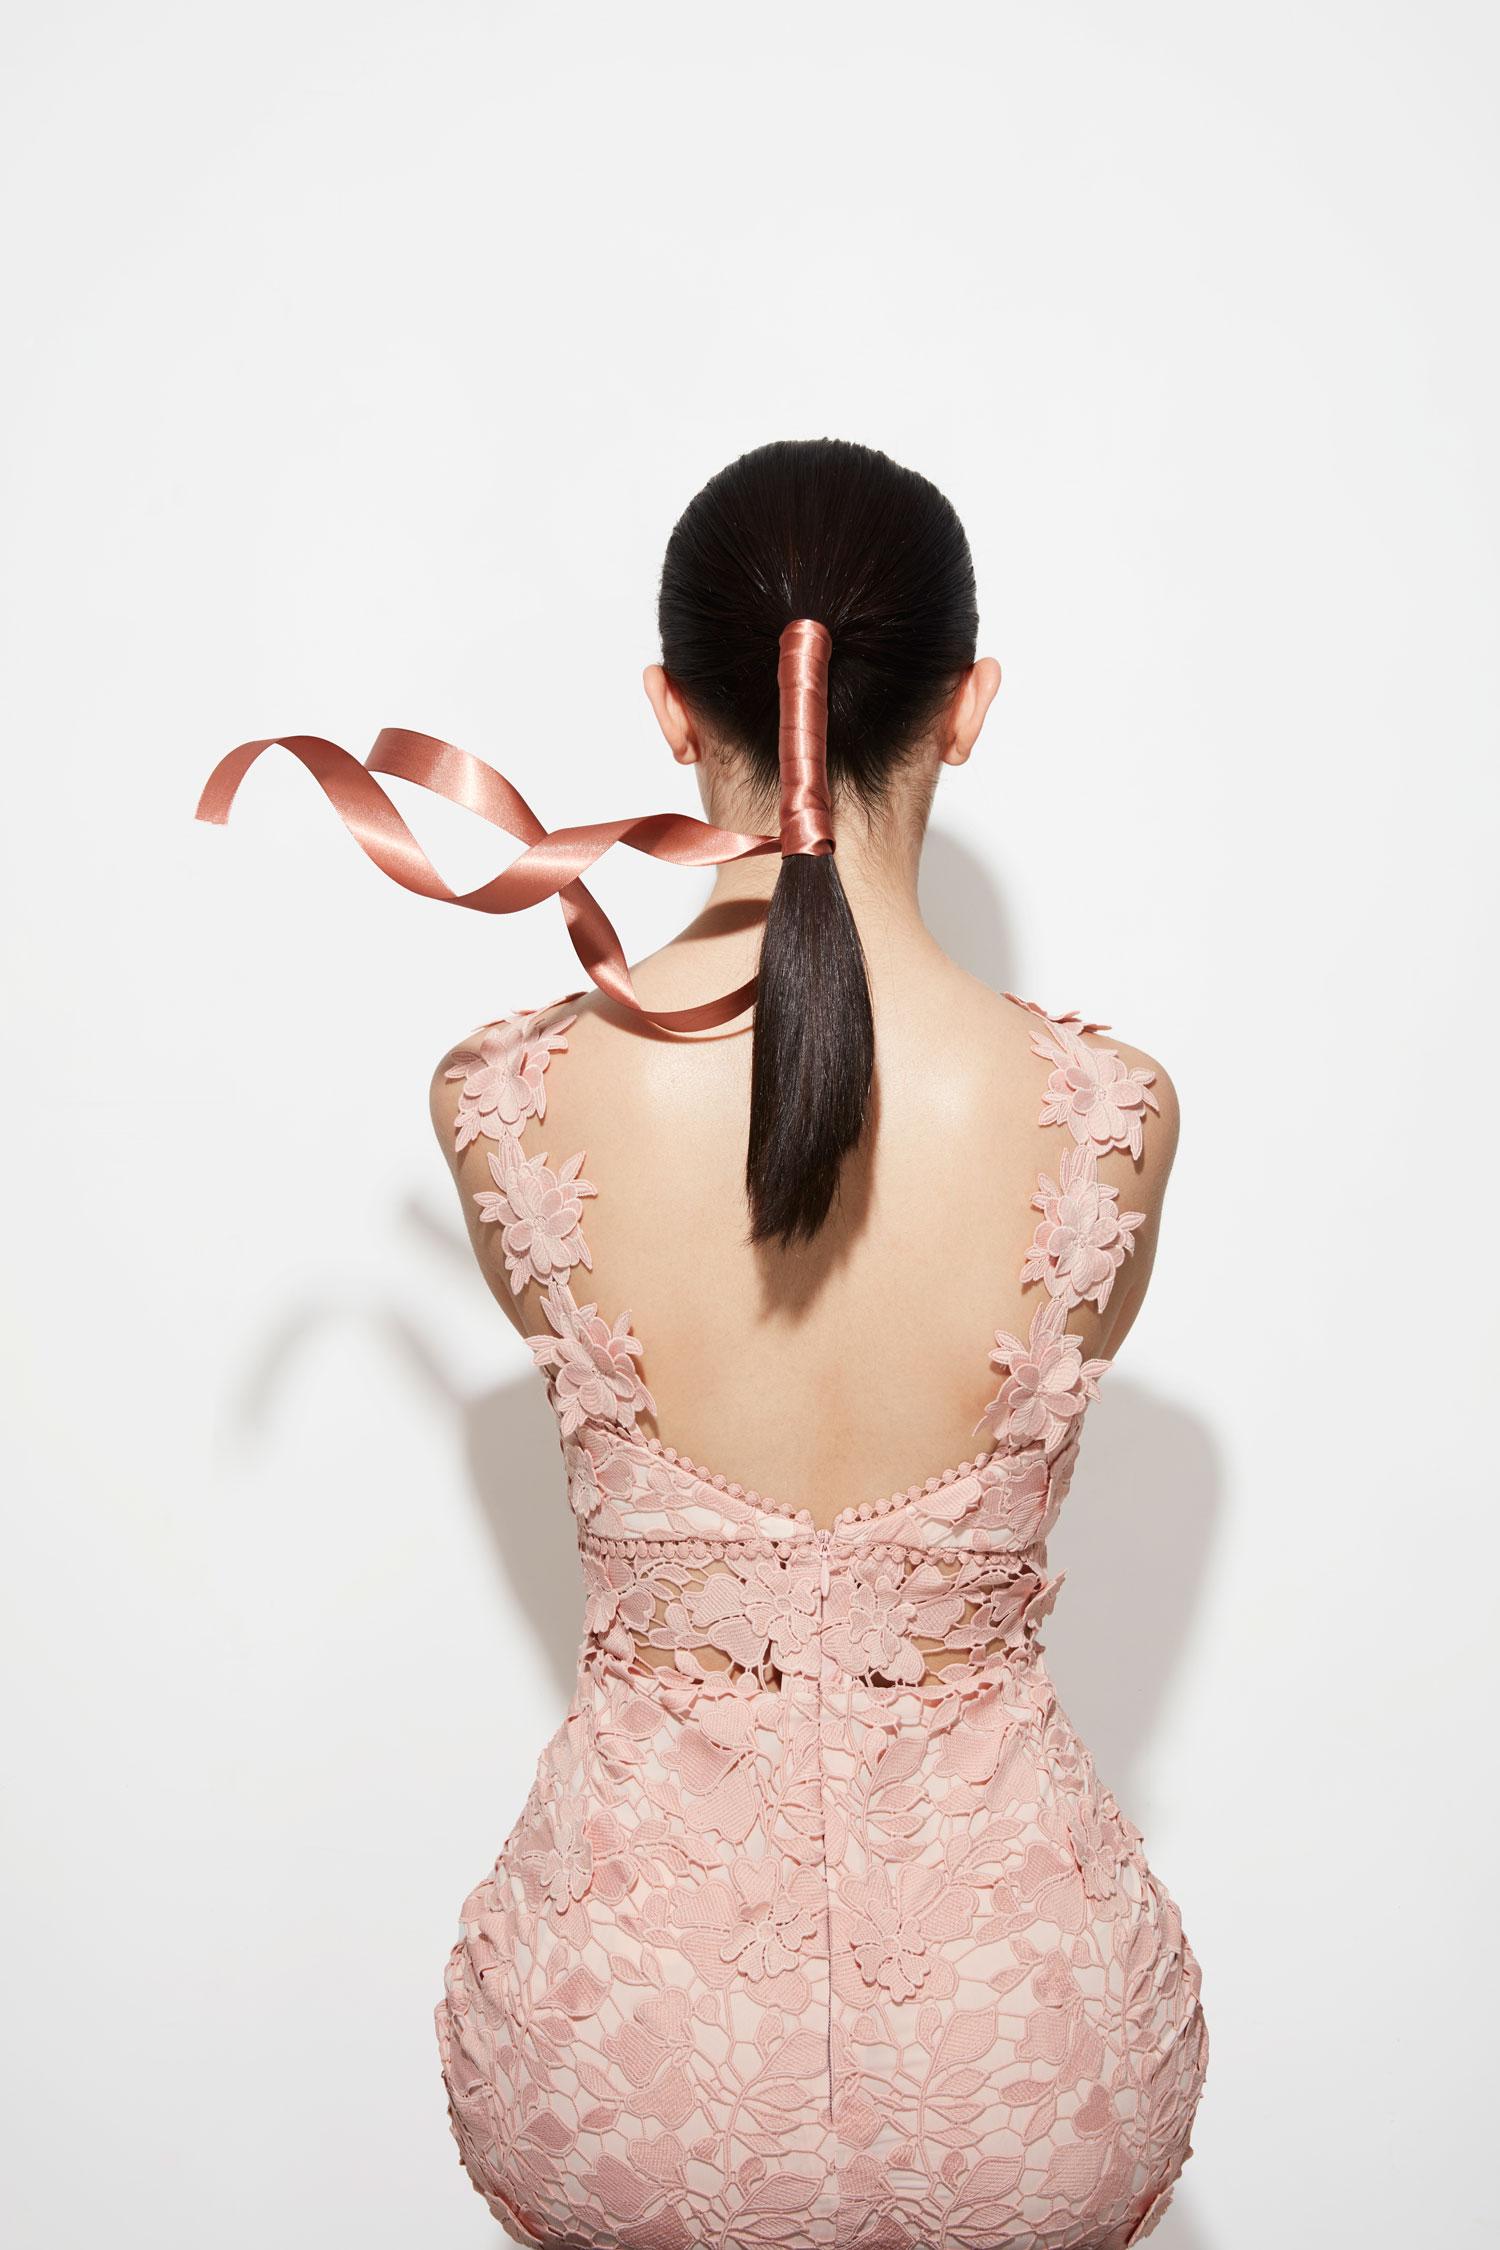 sarah-cochran-creative-stylist-wardrobe-stylist-creative-director-minneapolis-st-paul-20.jpg